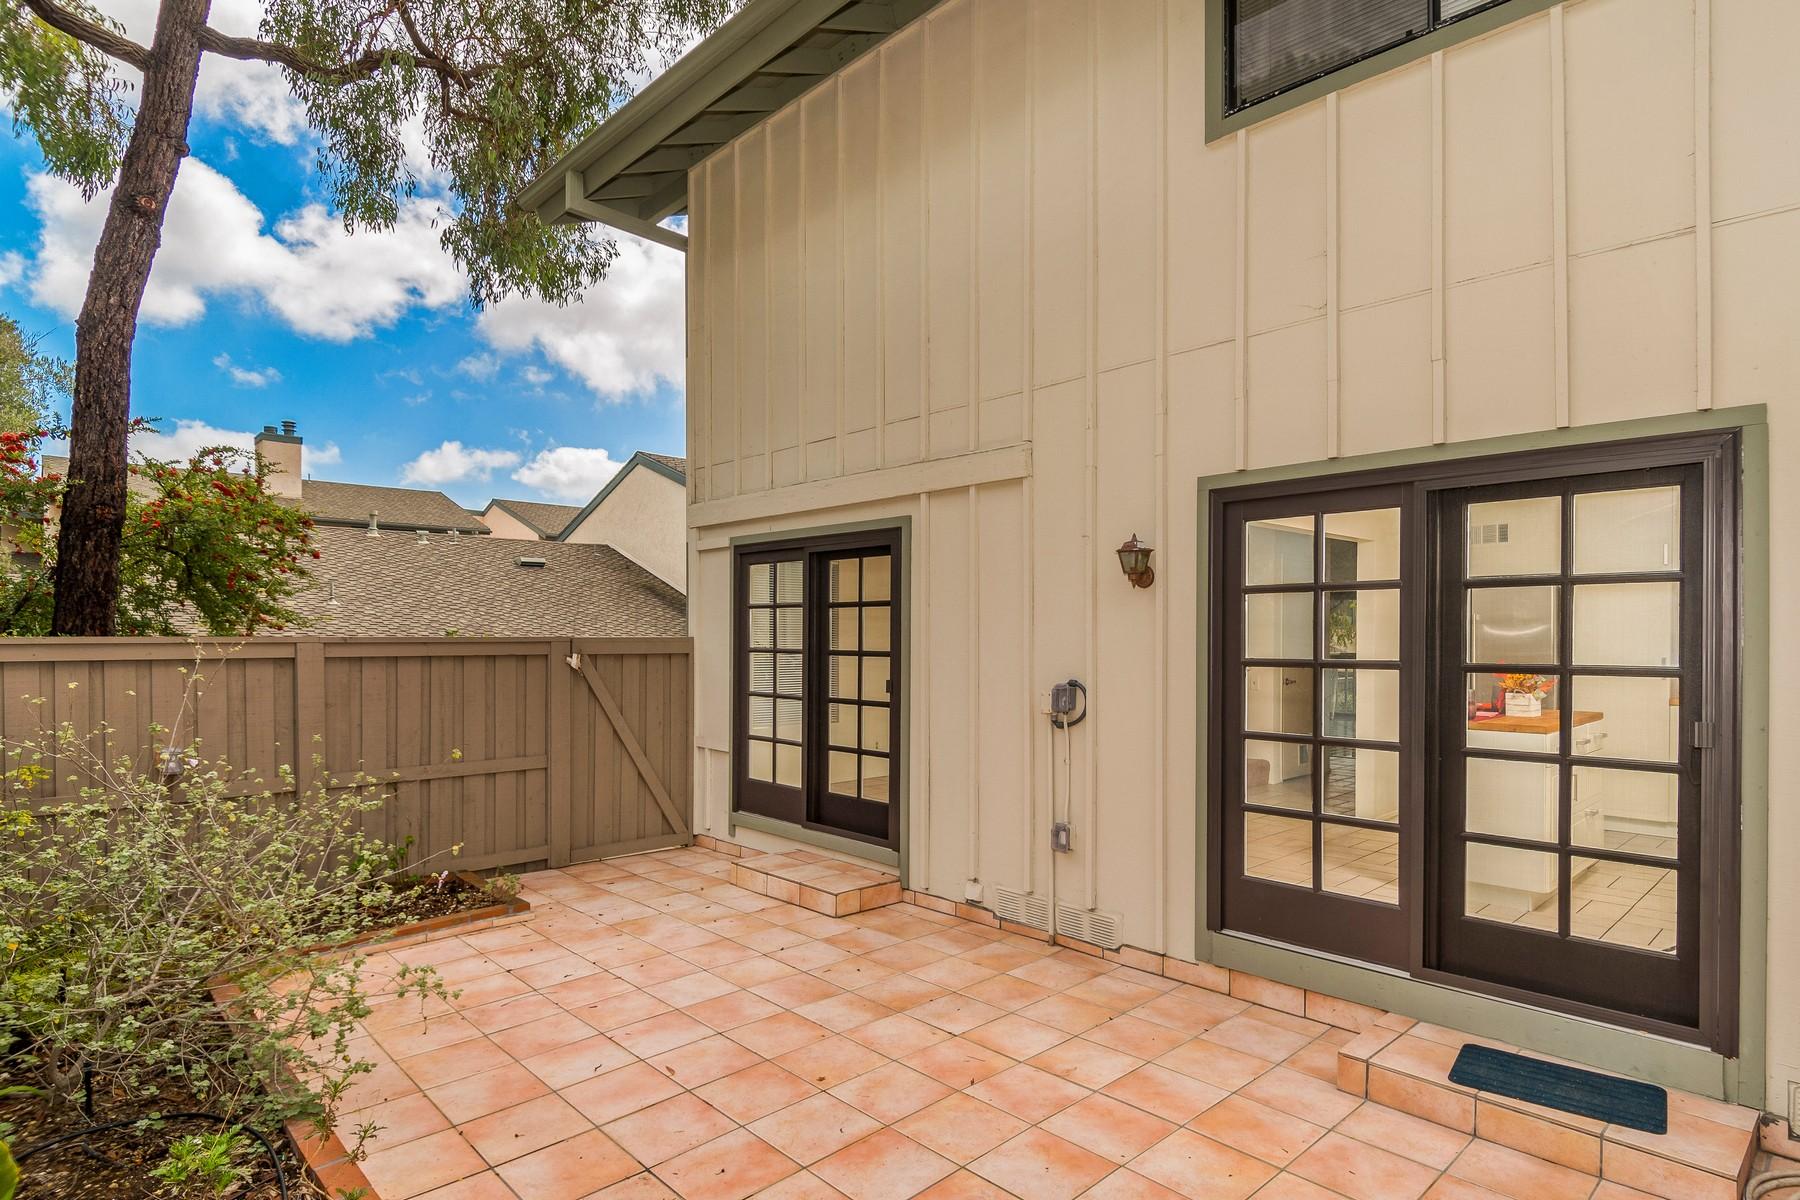 Additional photo for property listing at 8265 Via Mallorca  拉荷亚, 加利福尼亚州 92037 美国